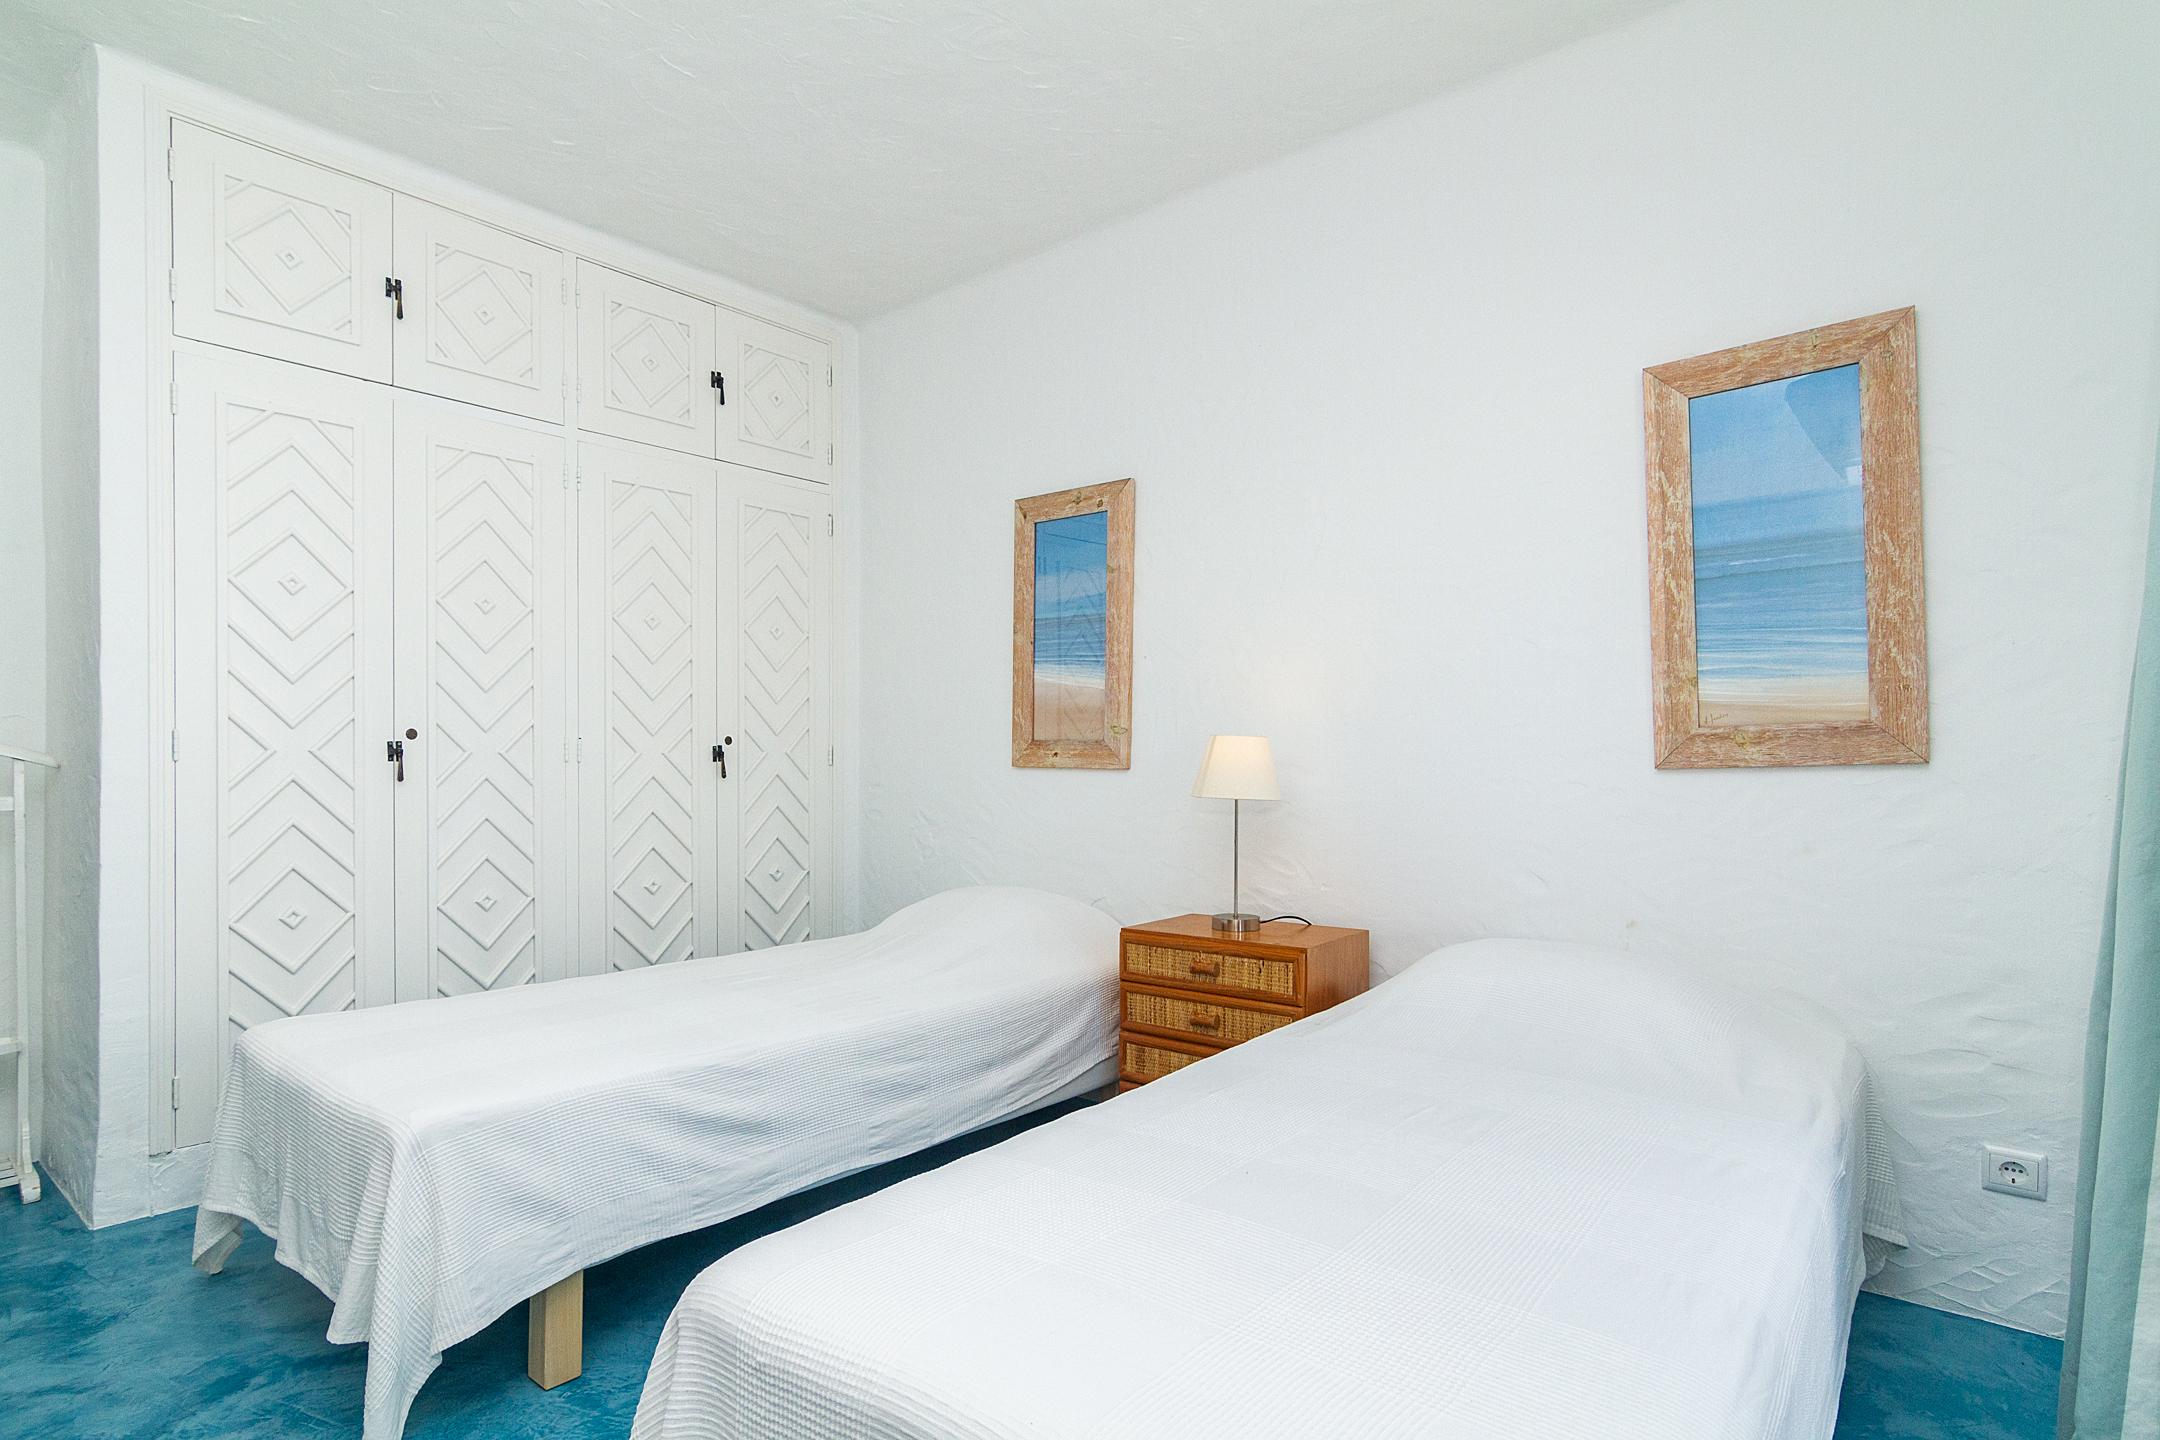 Location appartements et villas de vacance, Liiiving in Algarve | Alvor Blue Villa à Alvor, Portugal Algarve, REF_IMG_14545_14554